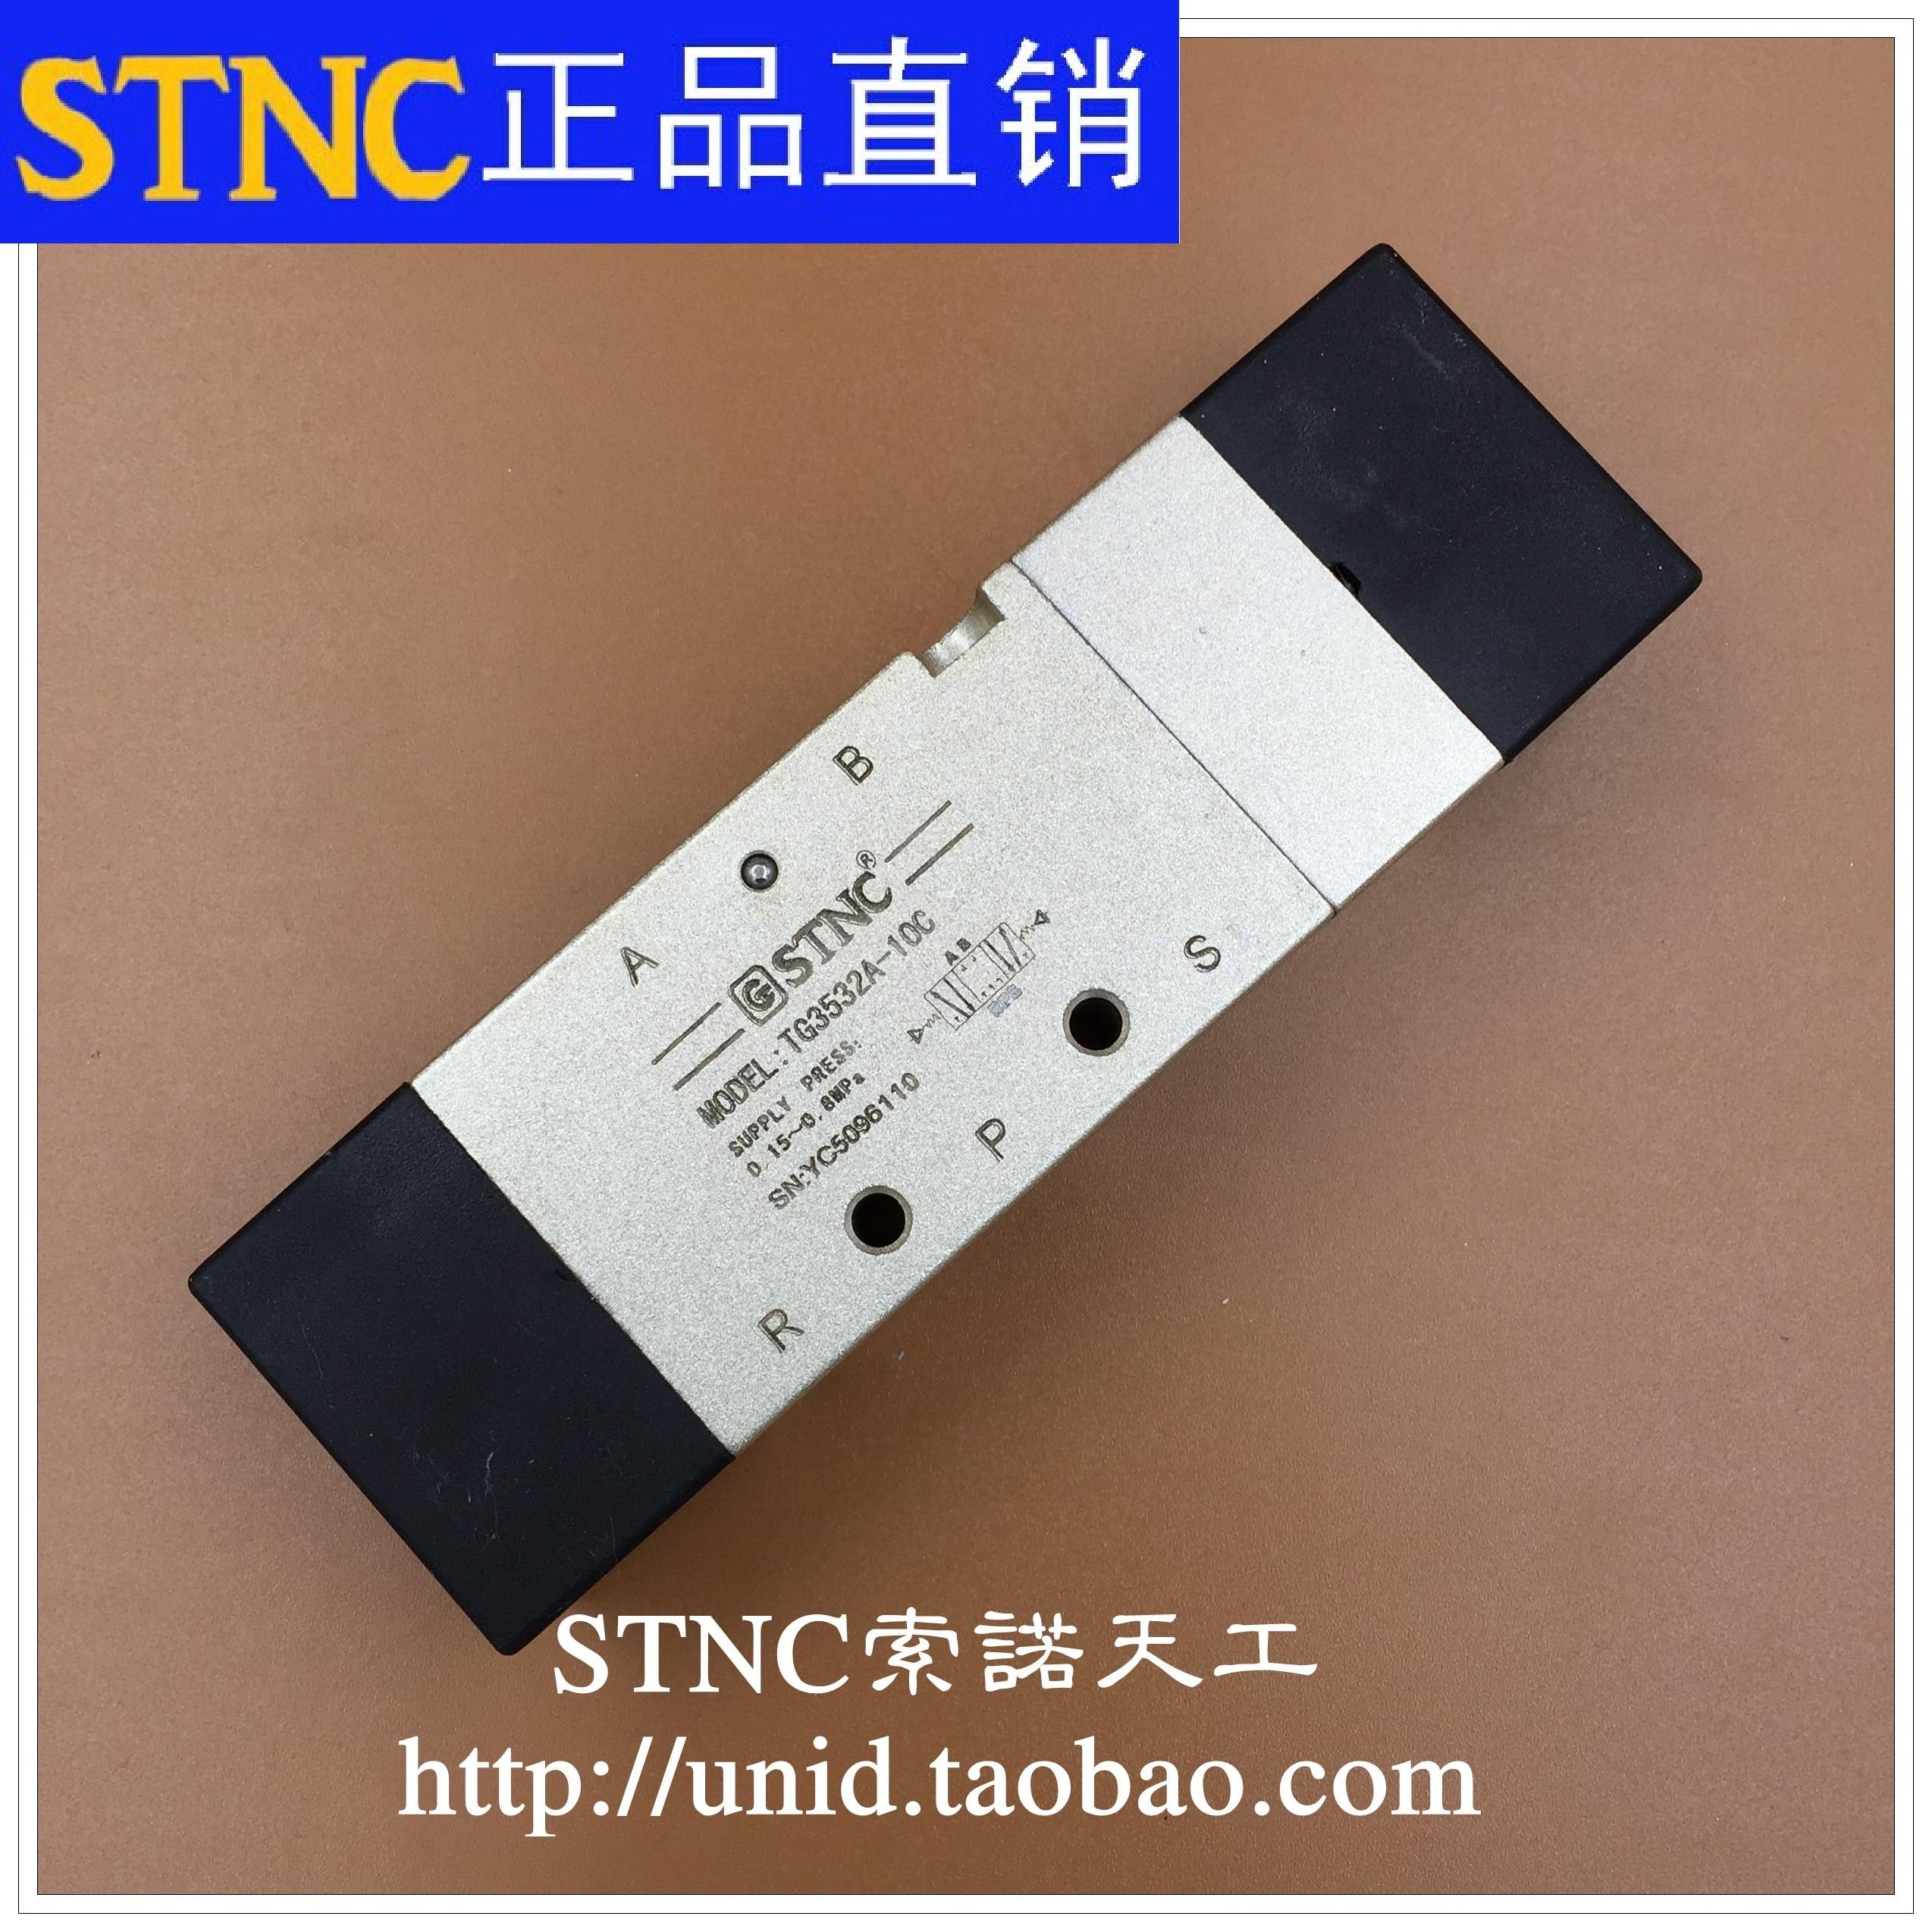 STNC gas control valve TG3532A-10C / seal type three five-pass mantra paola 3532